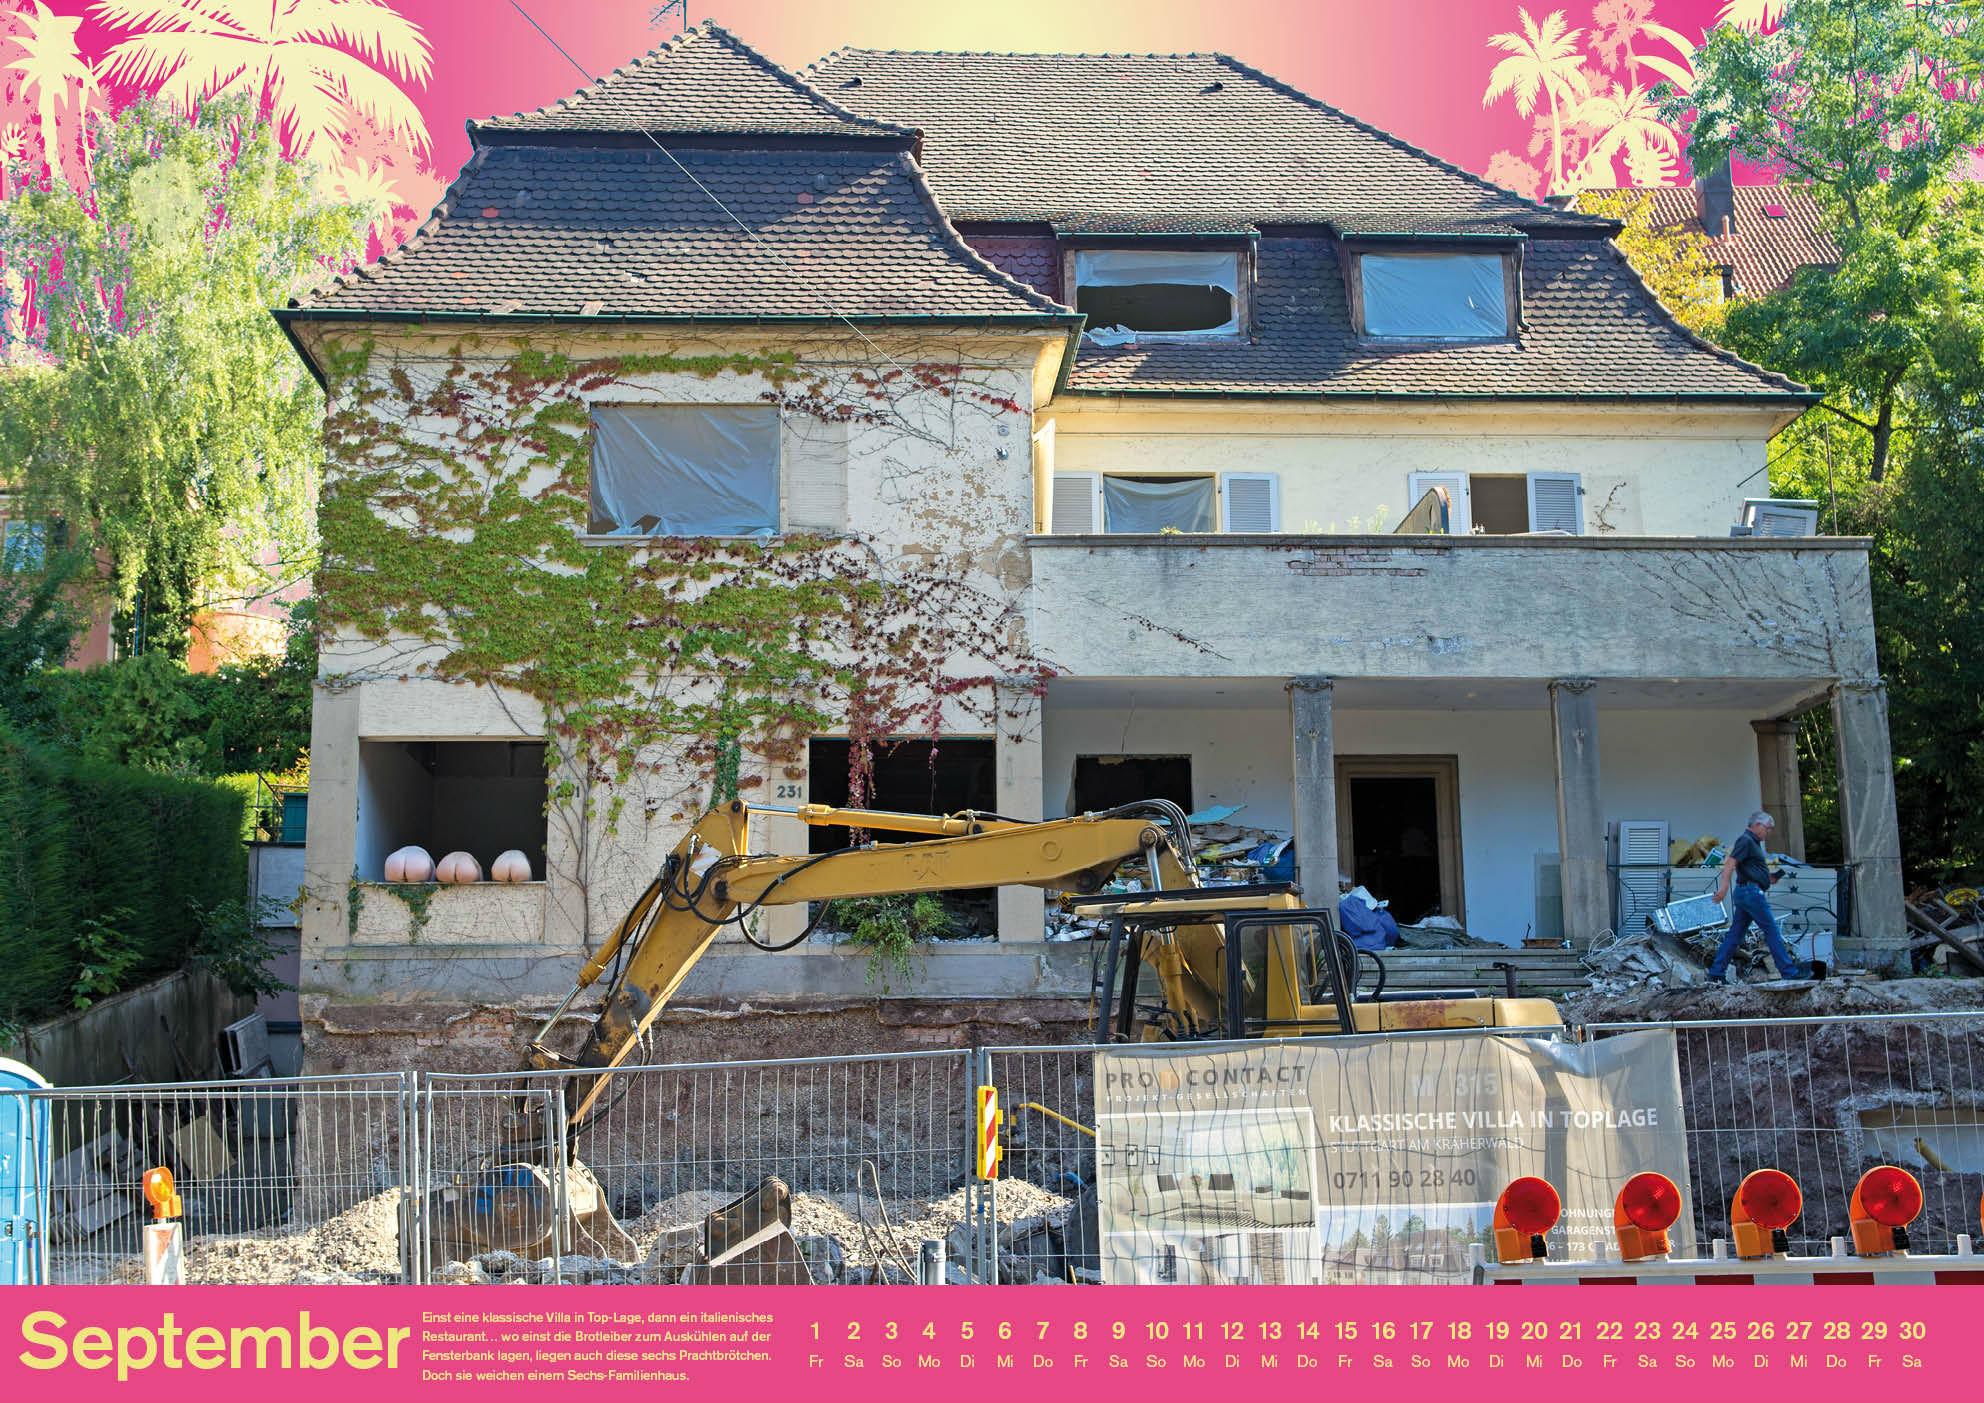 Kleon Medugorac Stuttgart under Construction 2016